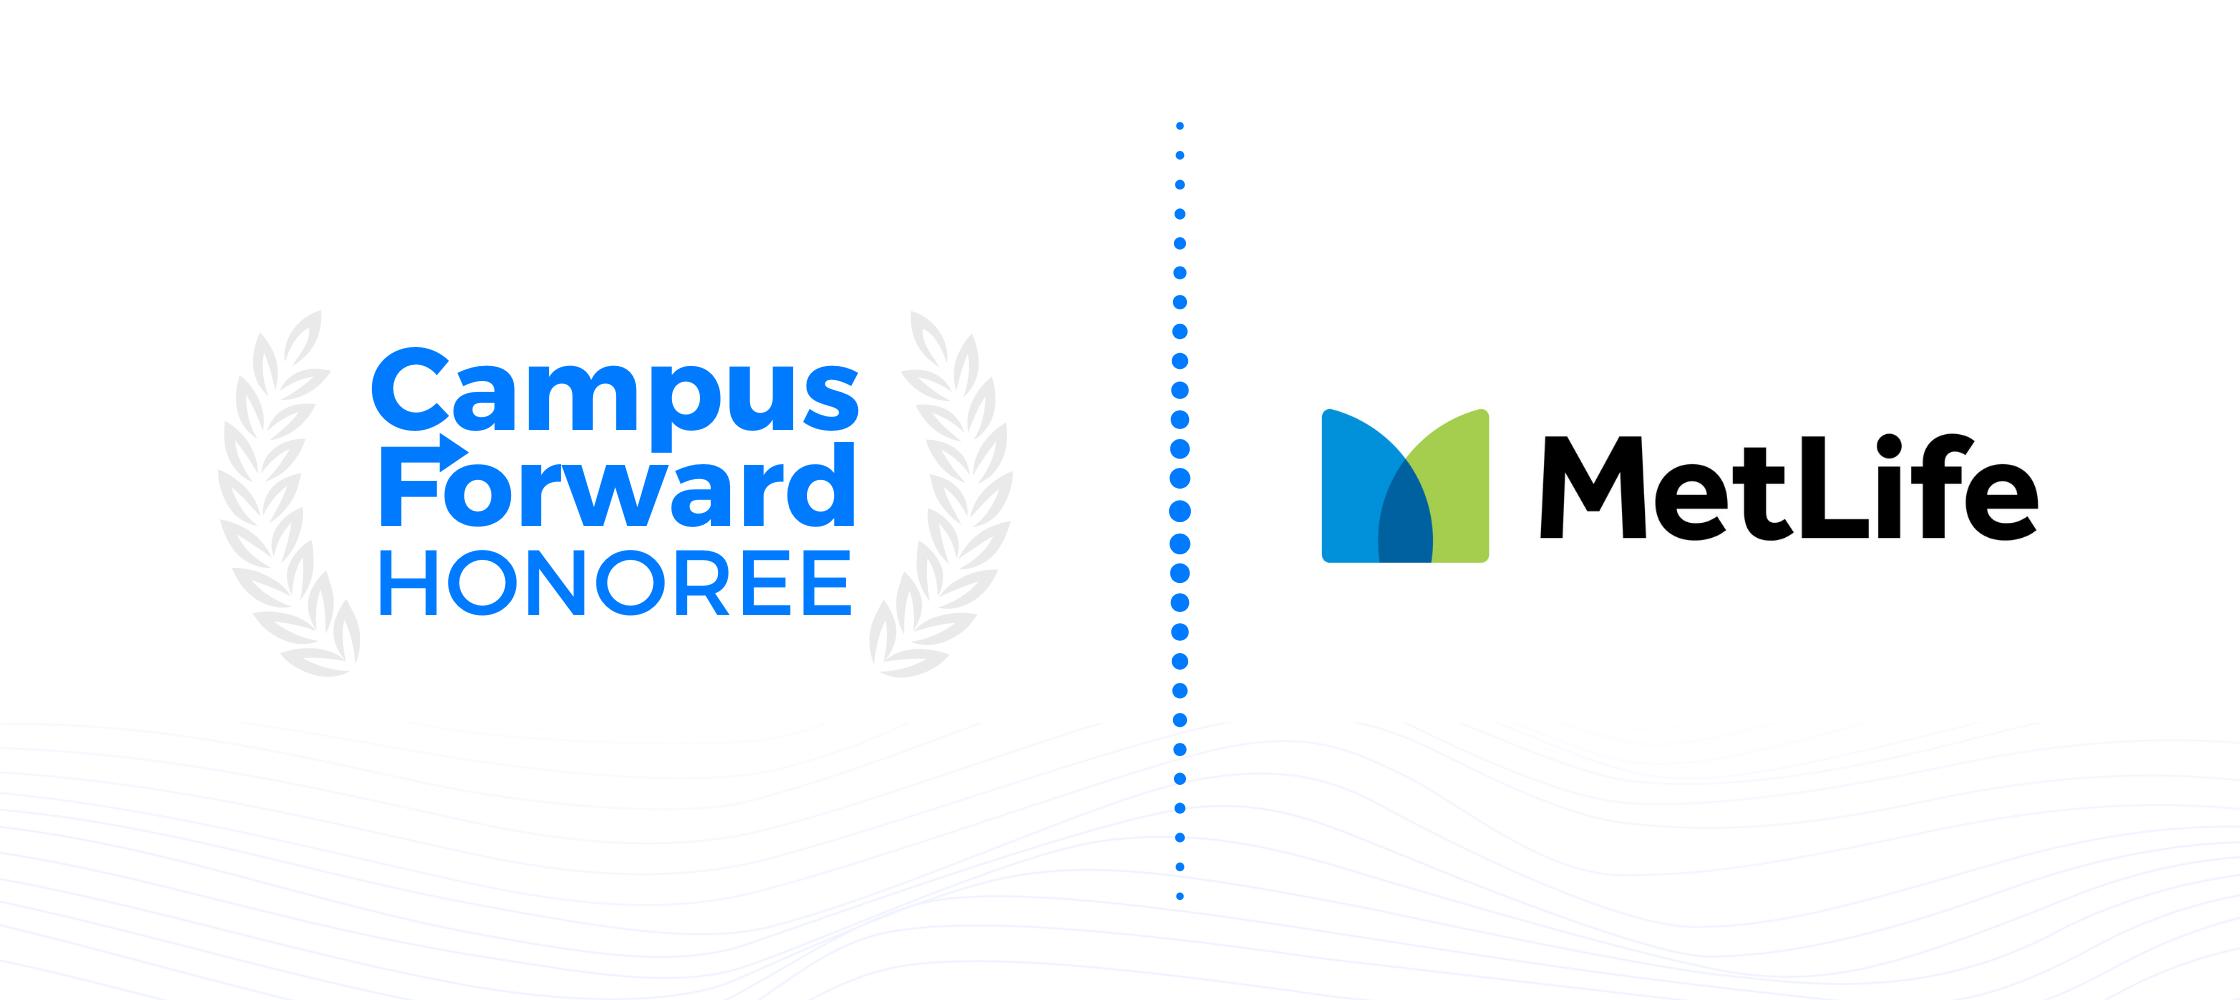 Campus Forward Honoree - MetLife